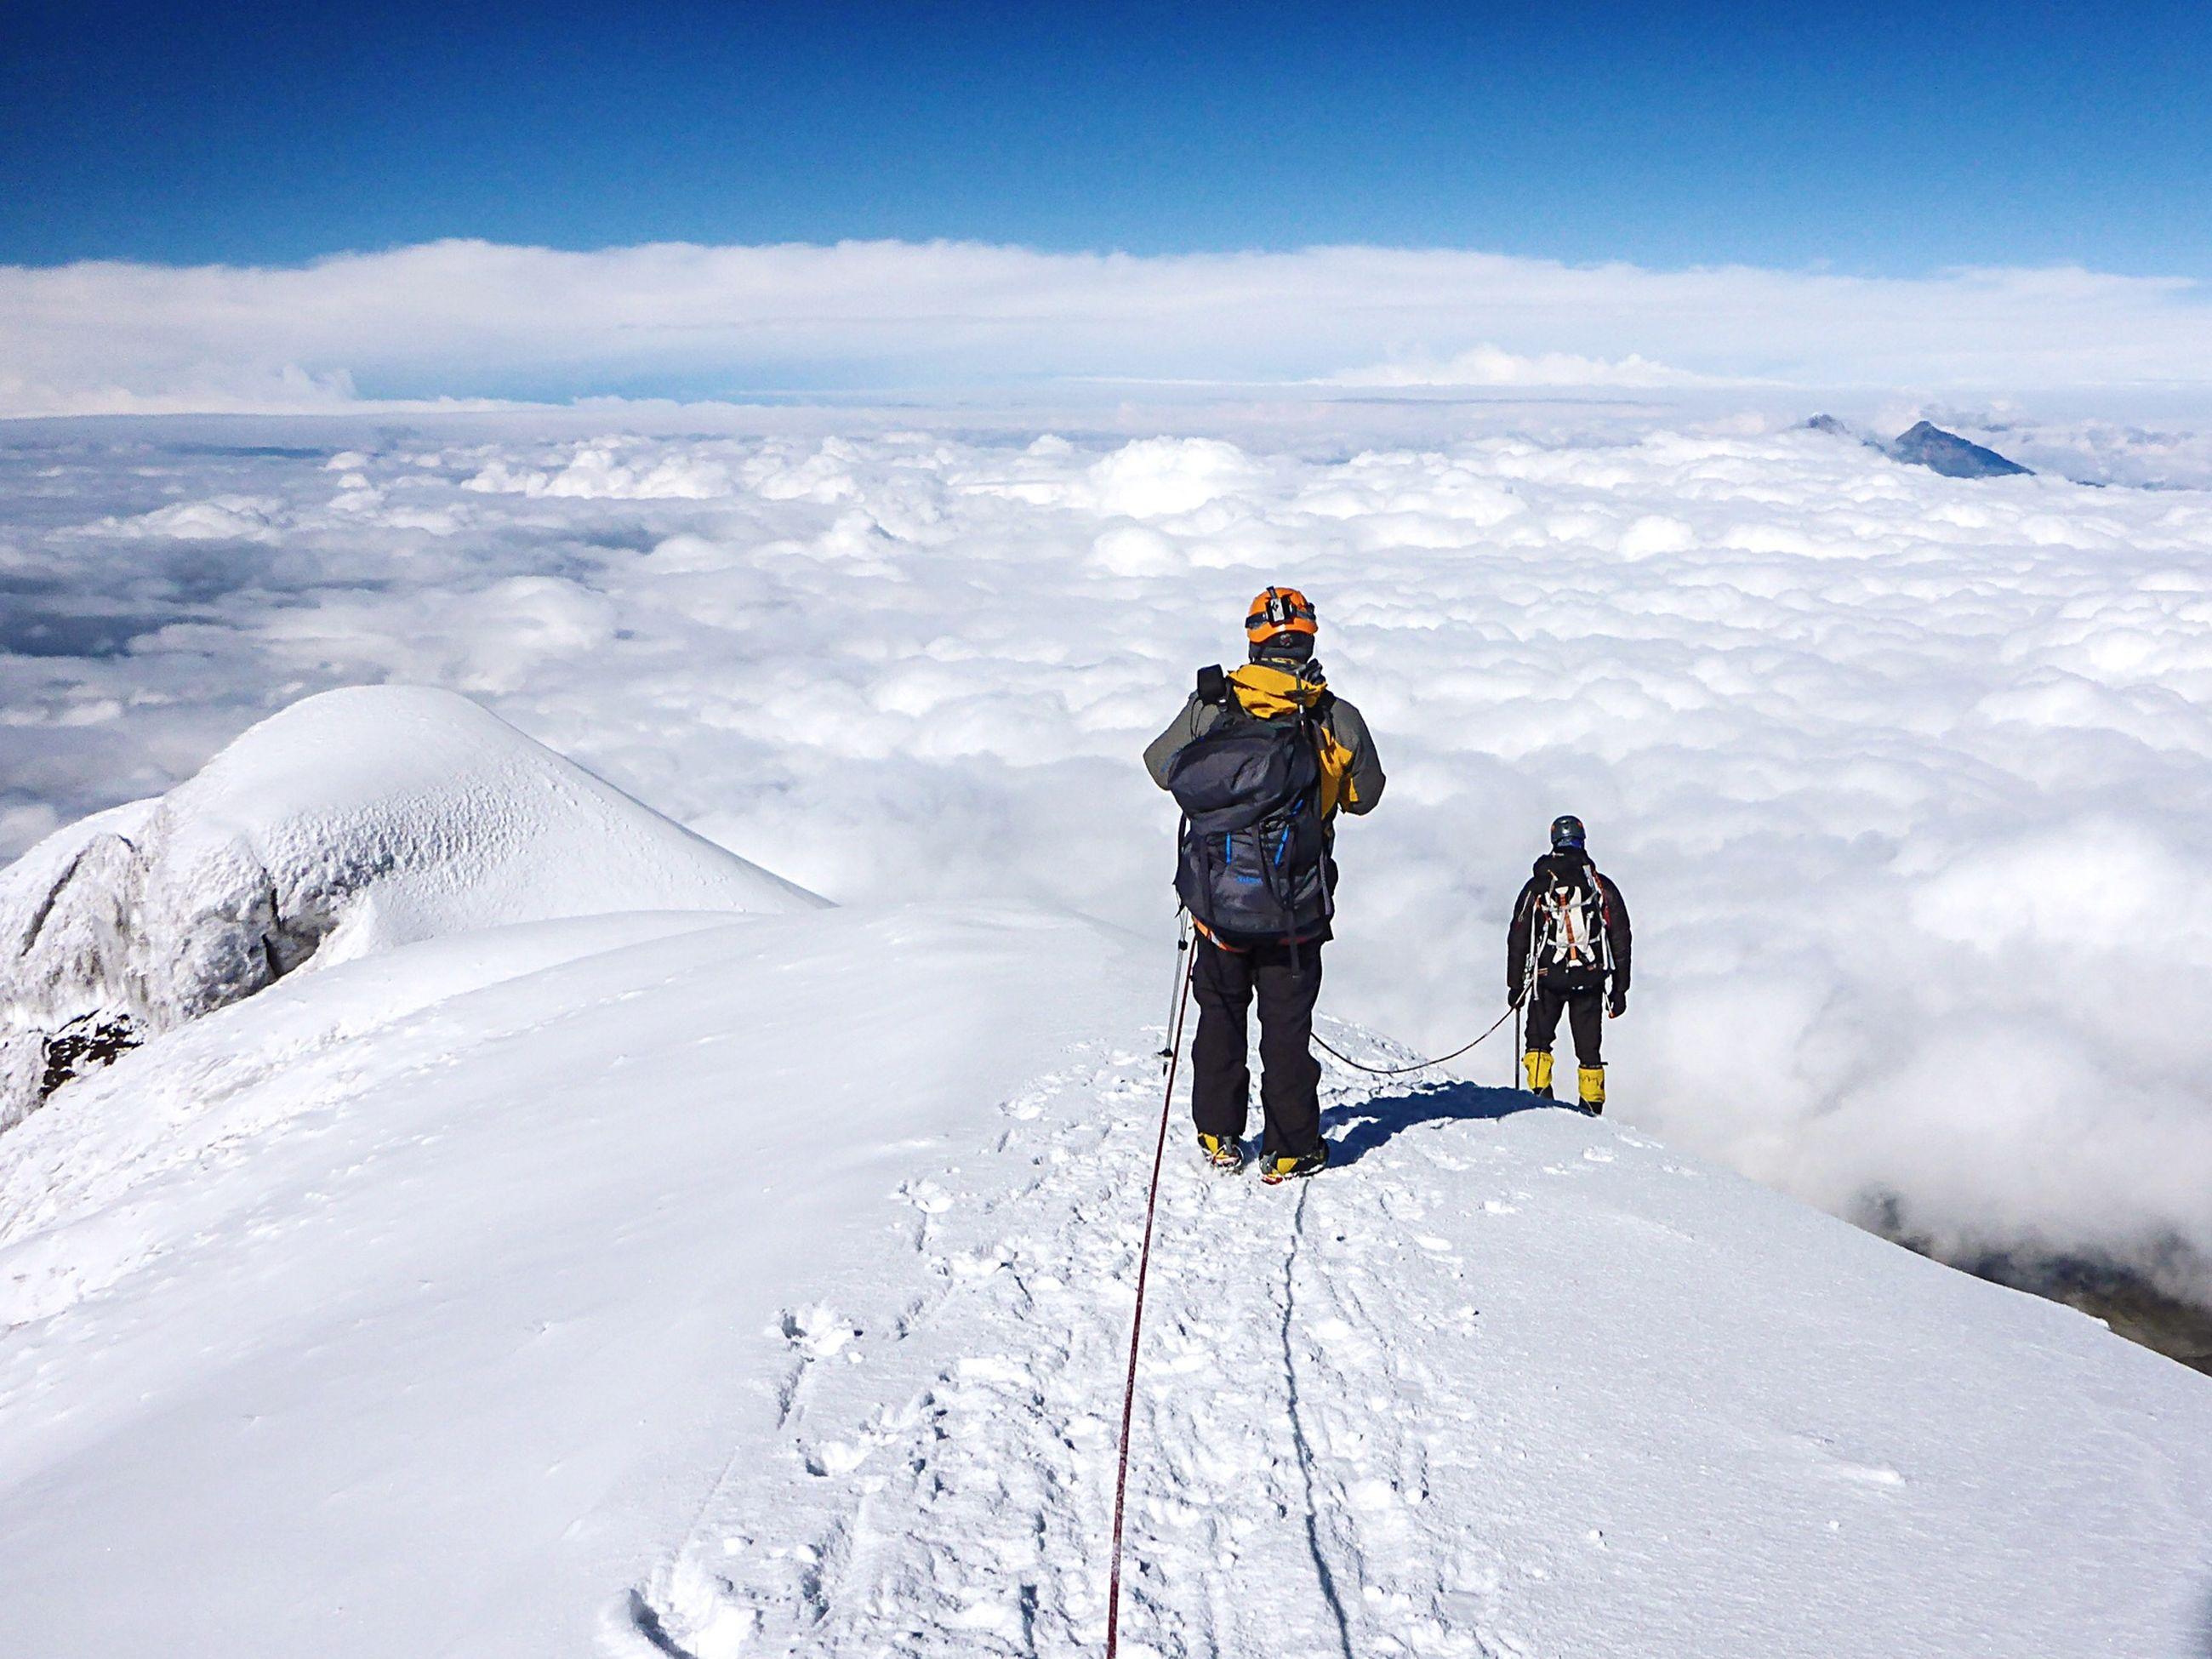 Mountain climber walking on snow covered mountain